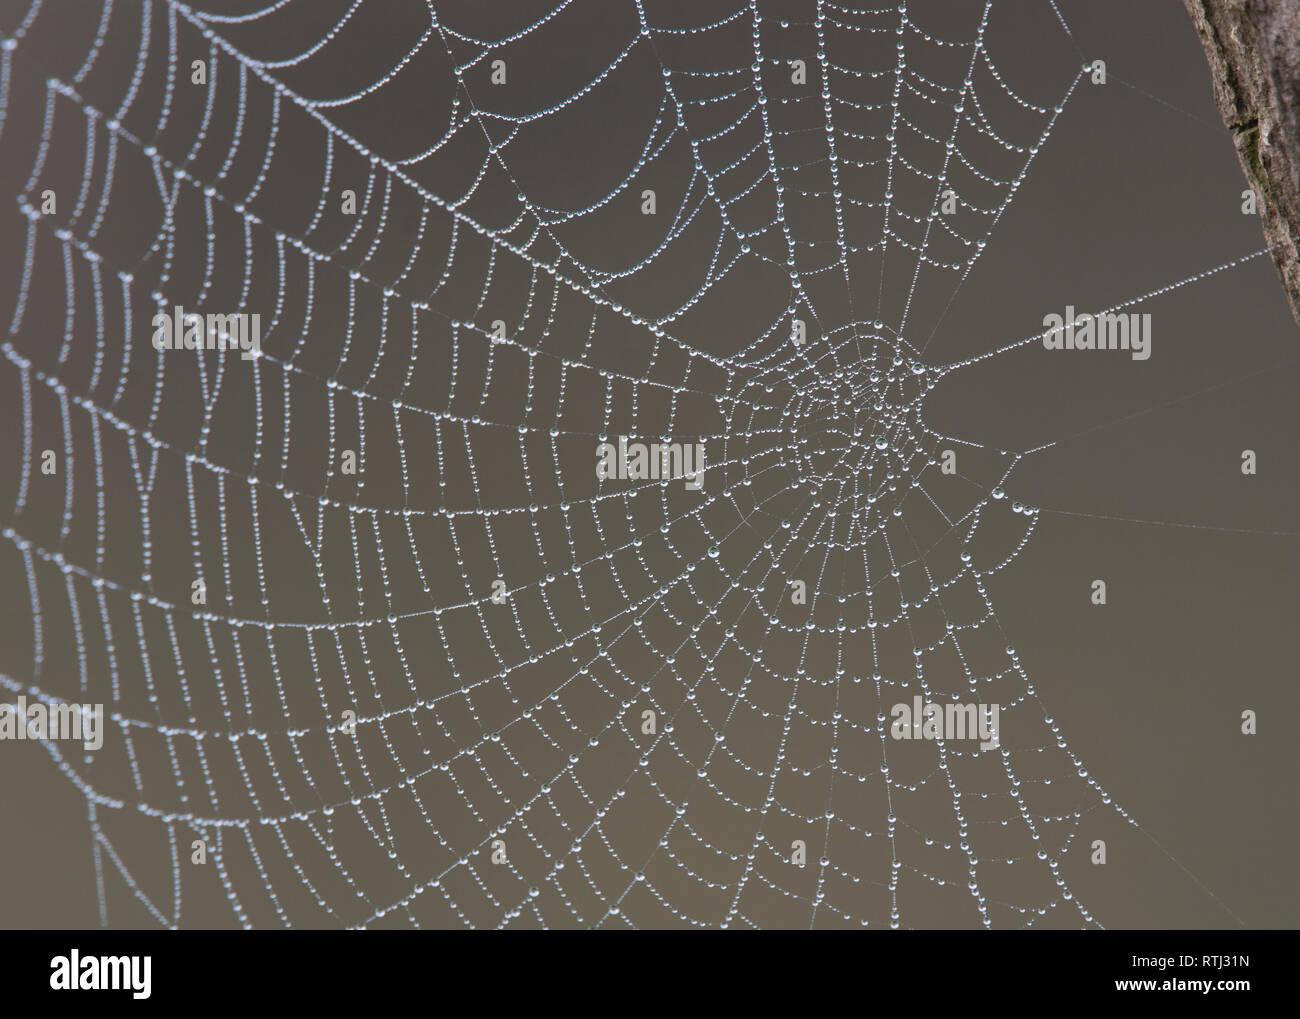 Cobweb with dewdrops - Stock Image